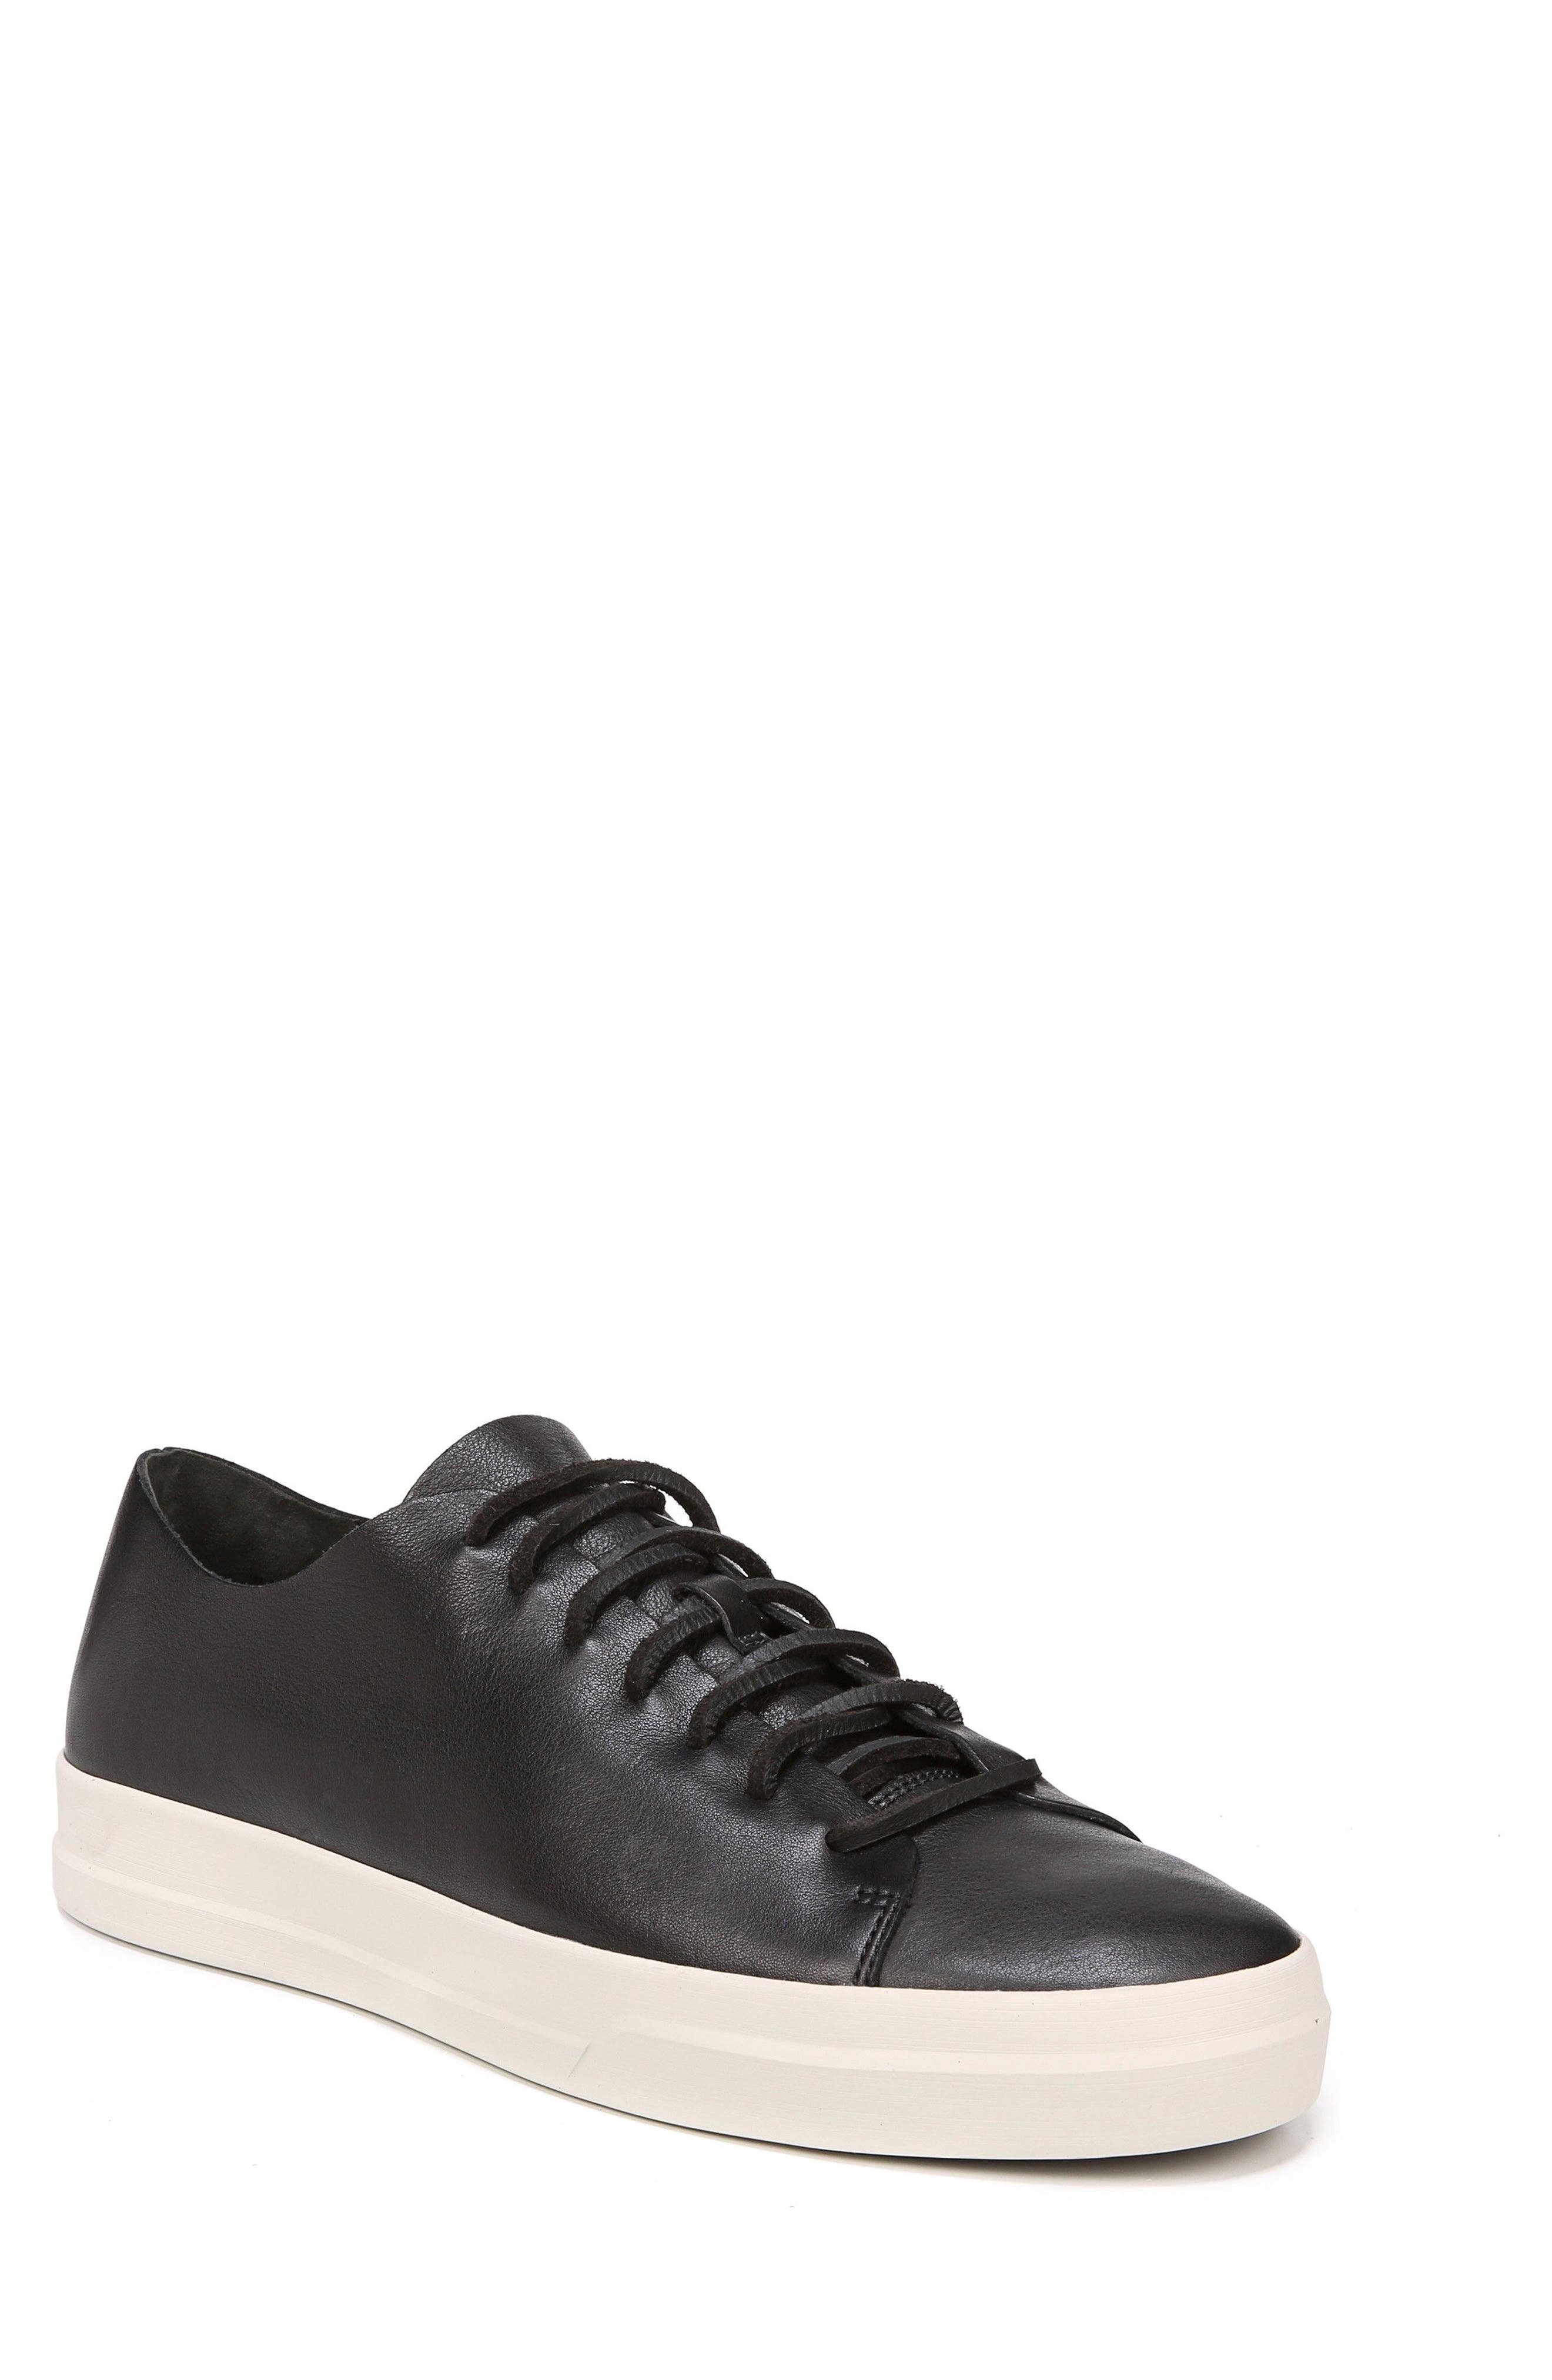 Copeland Sneaker,                         Main,                         color, BLACK